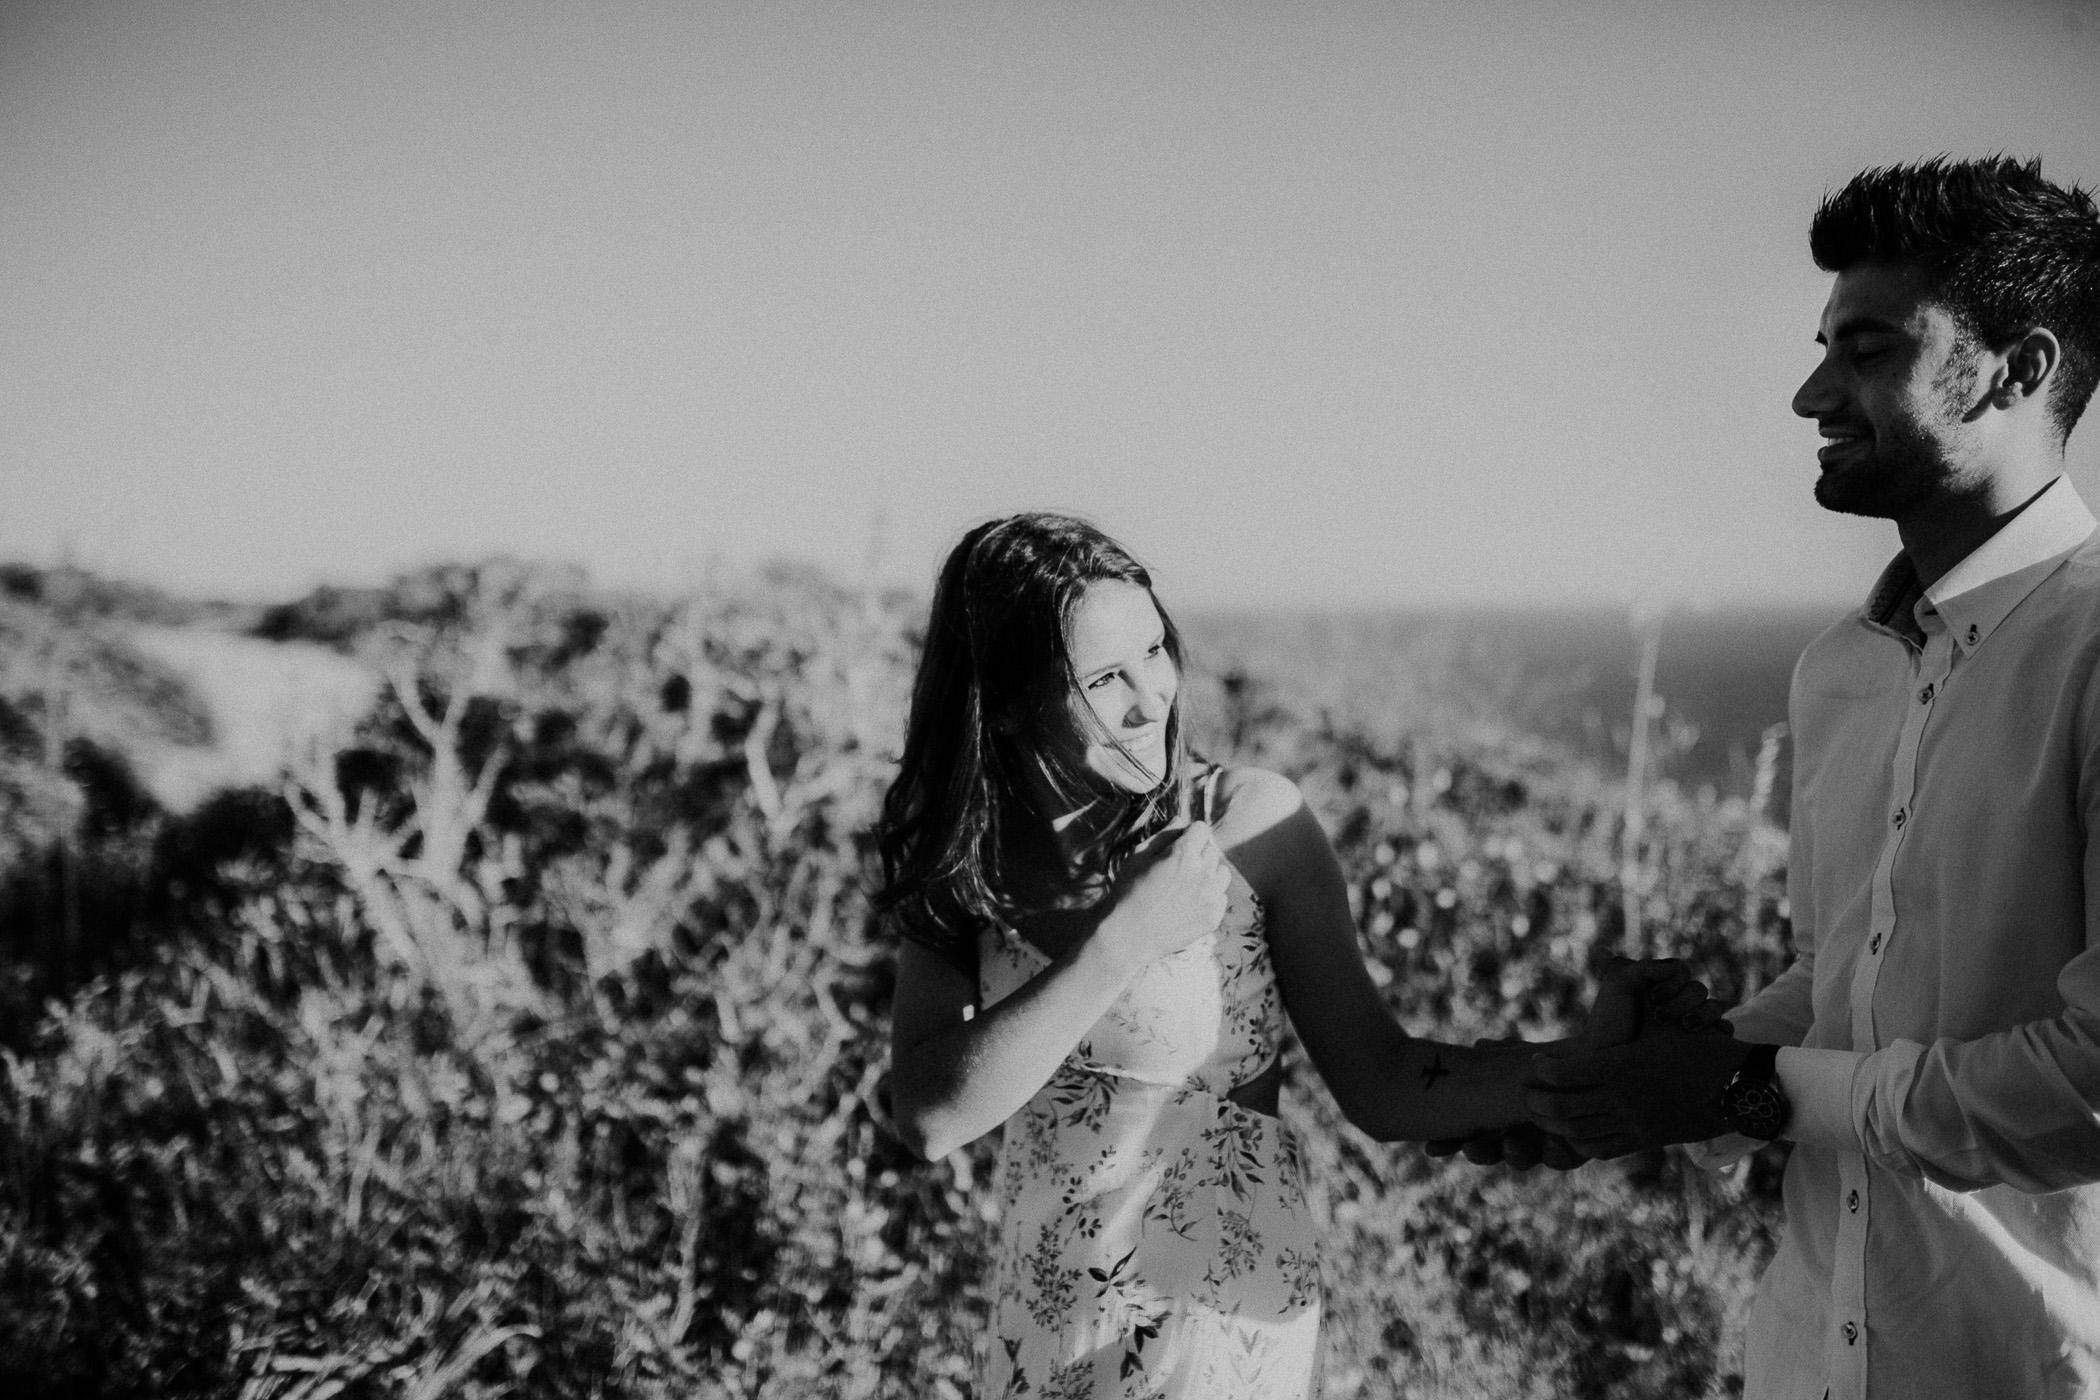 DanielaMarquardtPhotography_wedding_elopement_mallorca_spain_calapi_palma_lauraandtoni_299